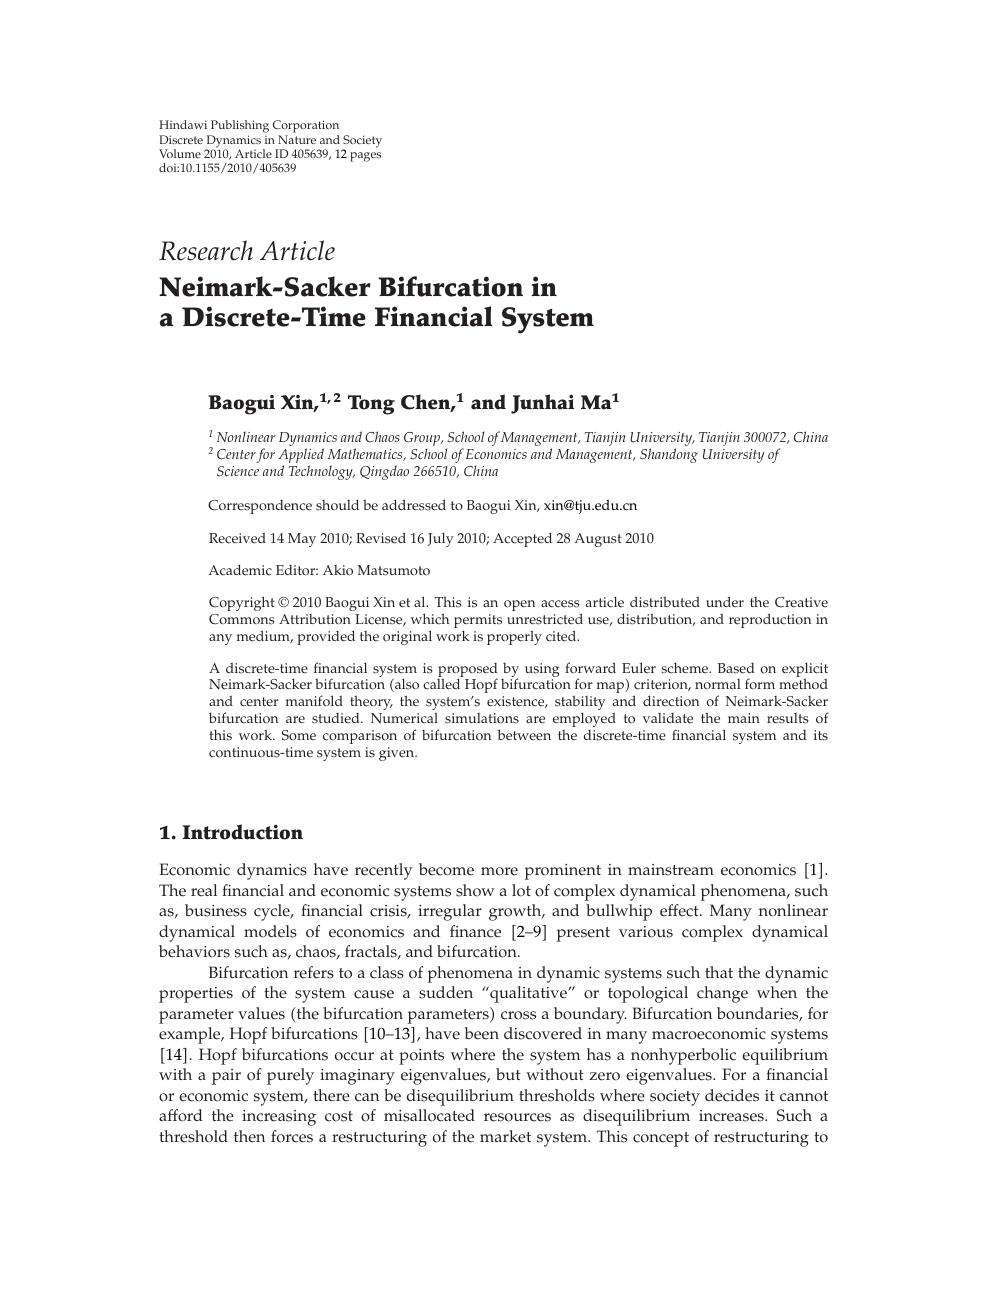 Neimark-Sacker Bifurcation in a Discrete-Time Financial